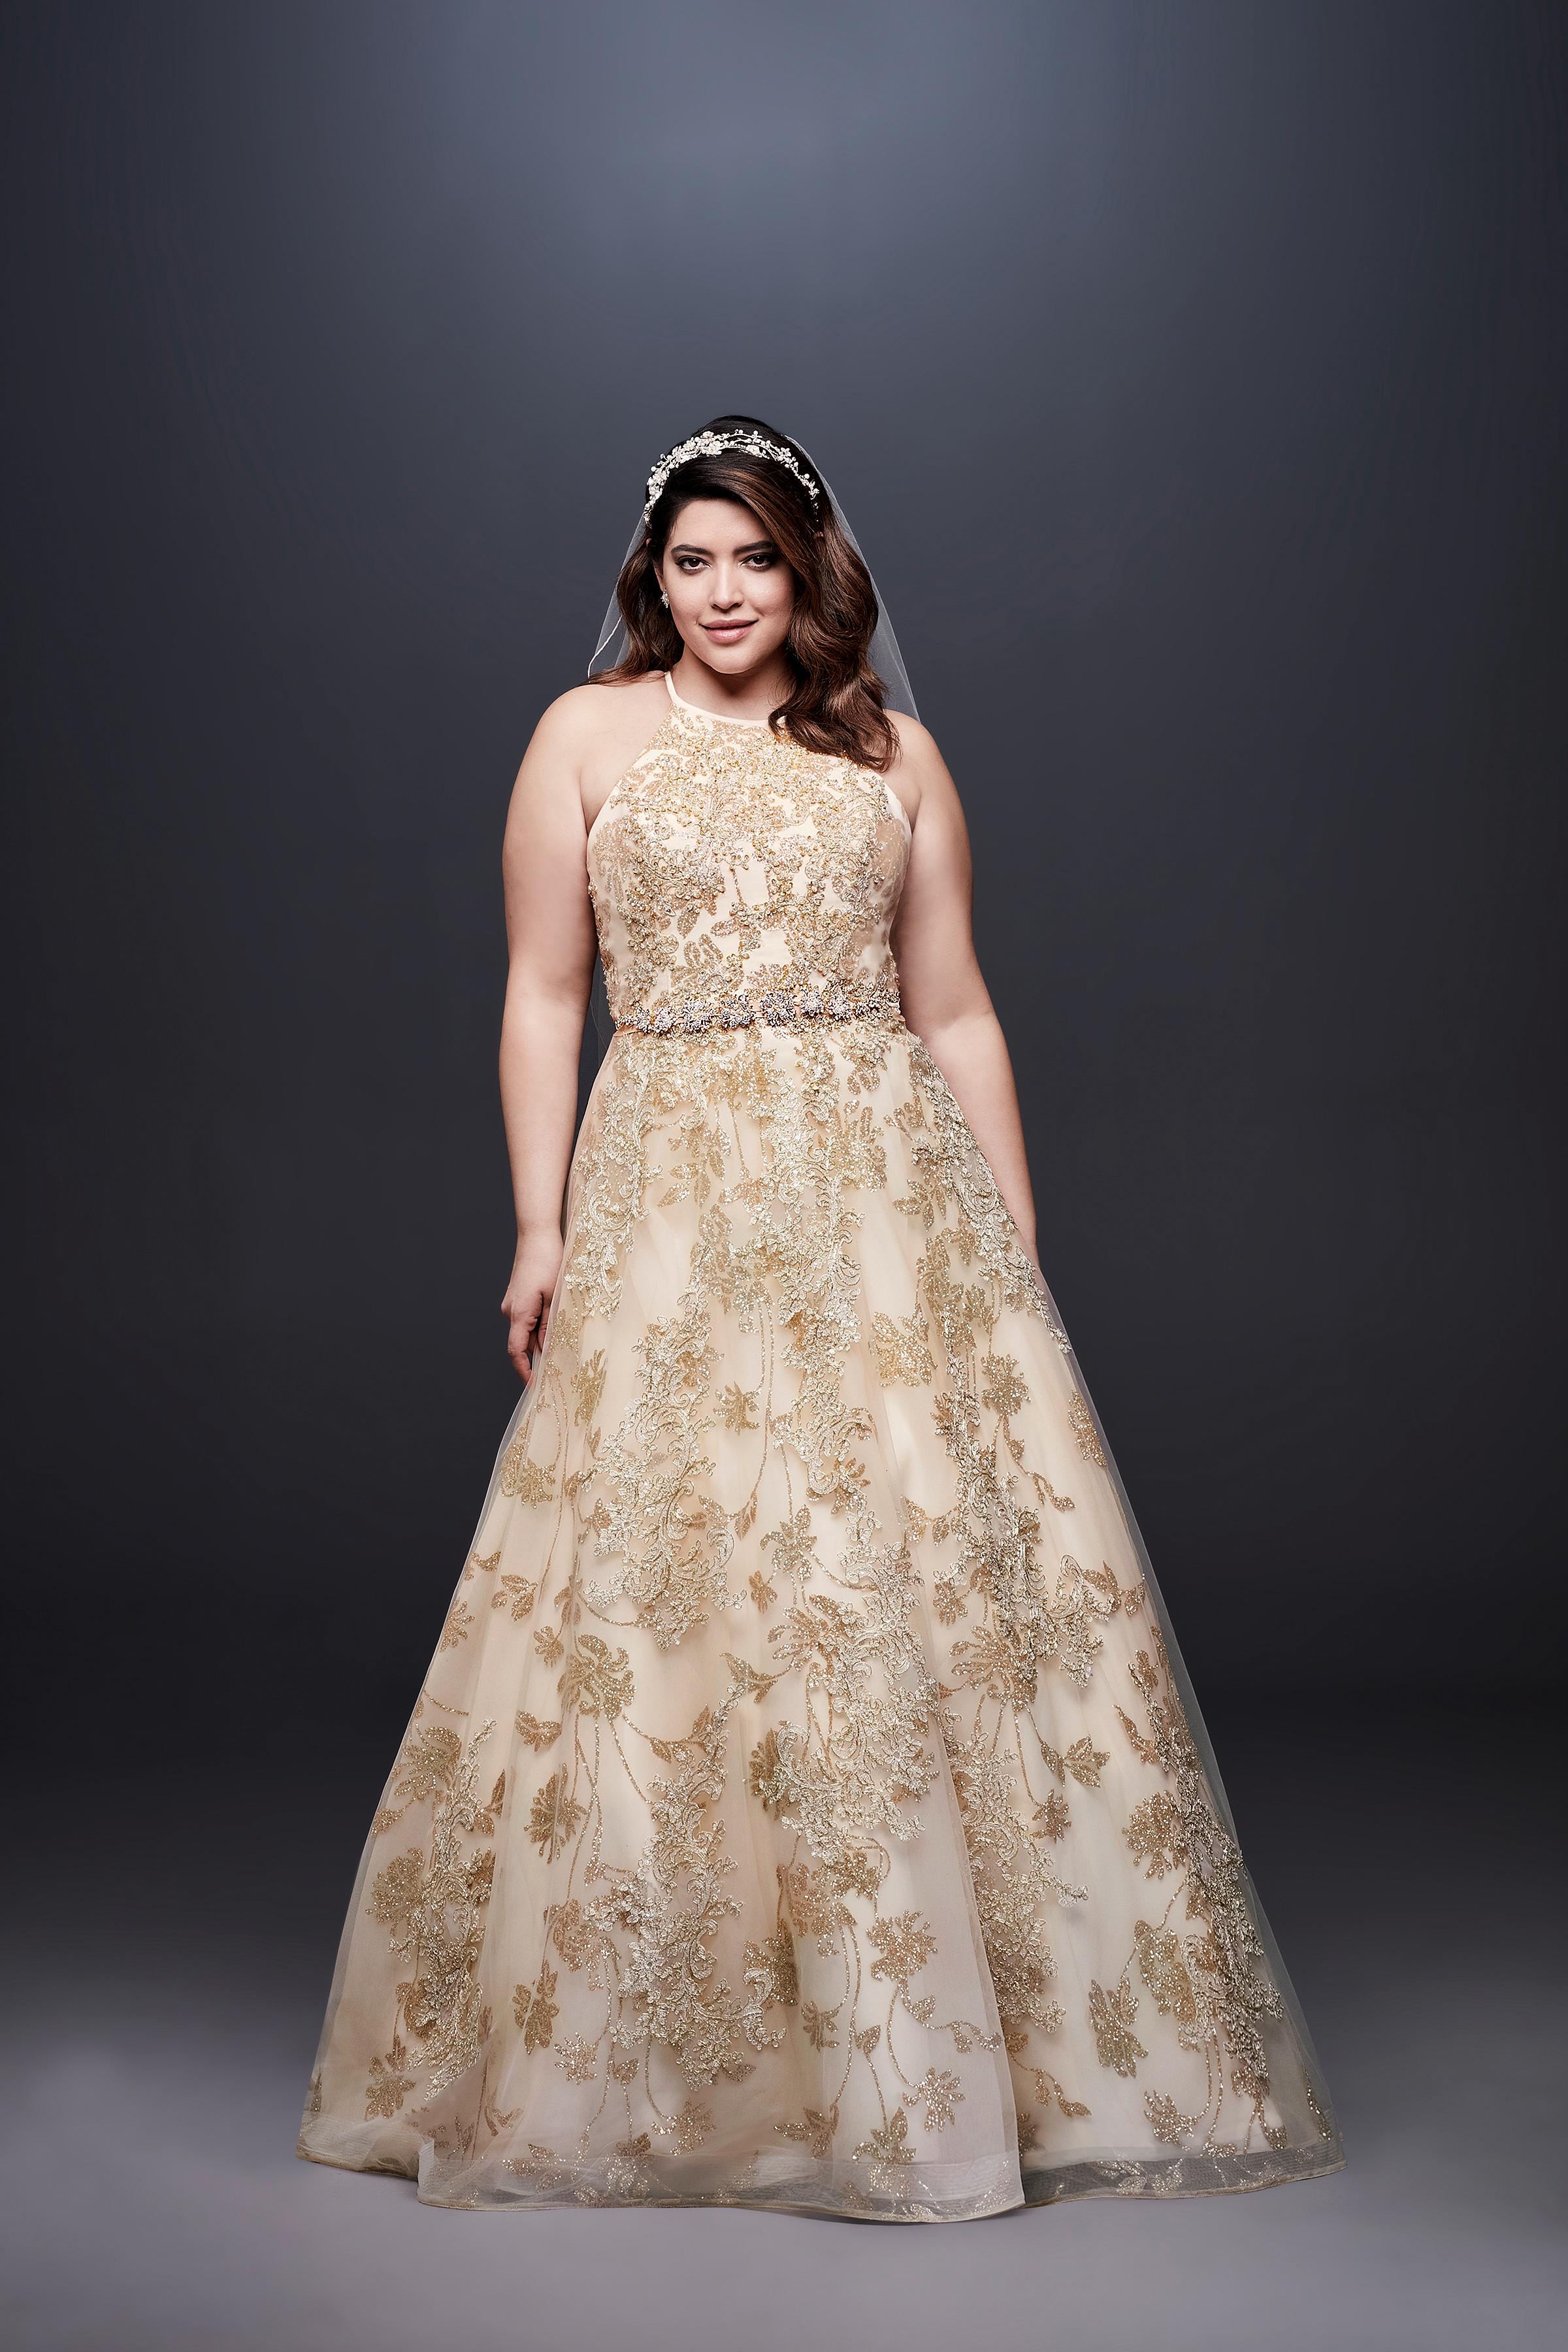 david bridal wedding dress spring 2019 halter a-line beaded gold